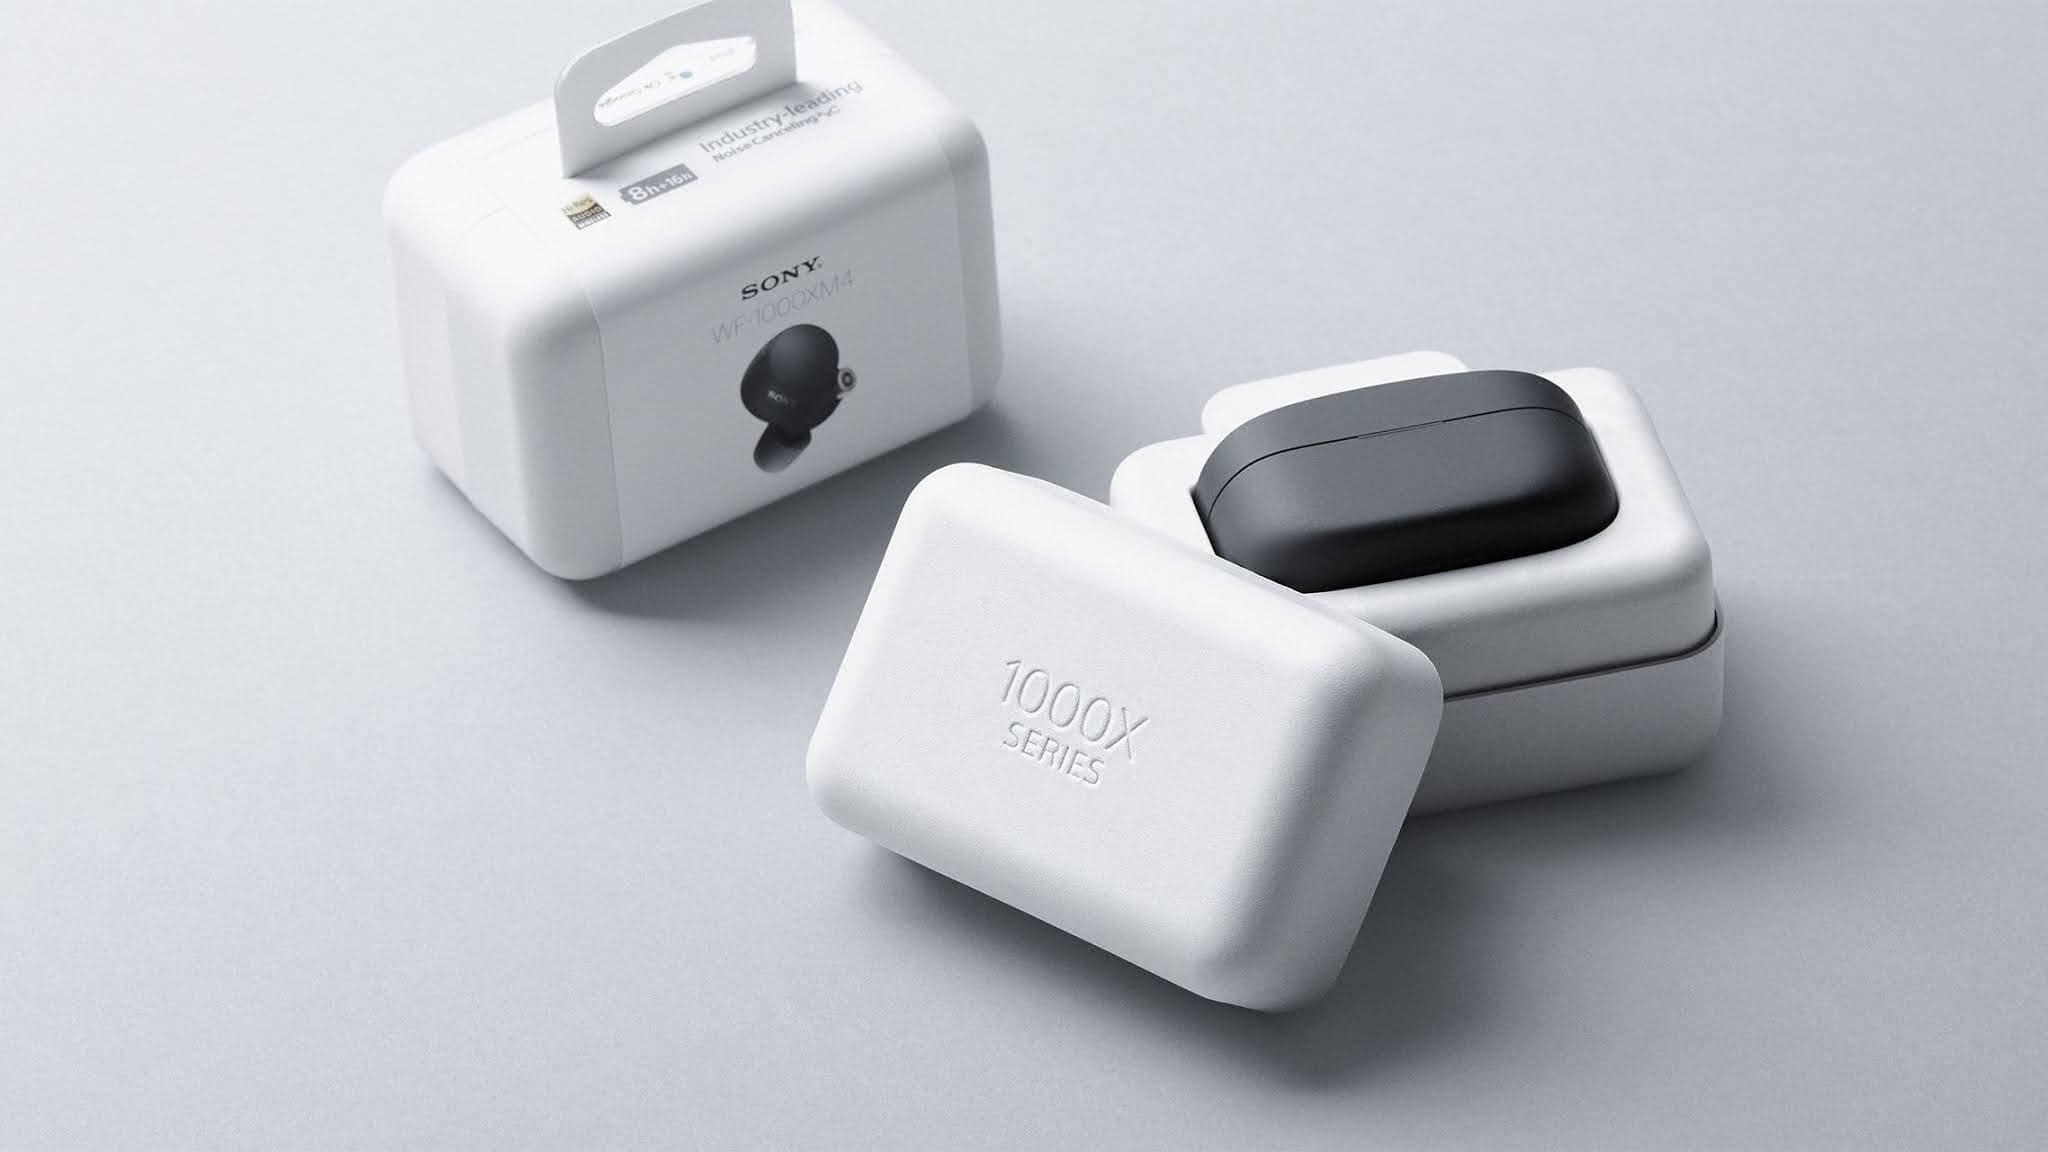 Hộp Tai nghe Sony WF-1000XM4